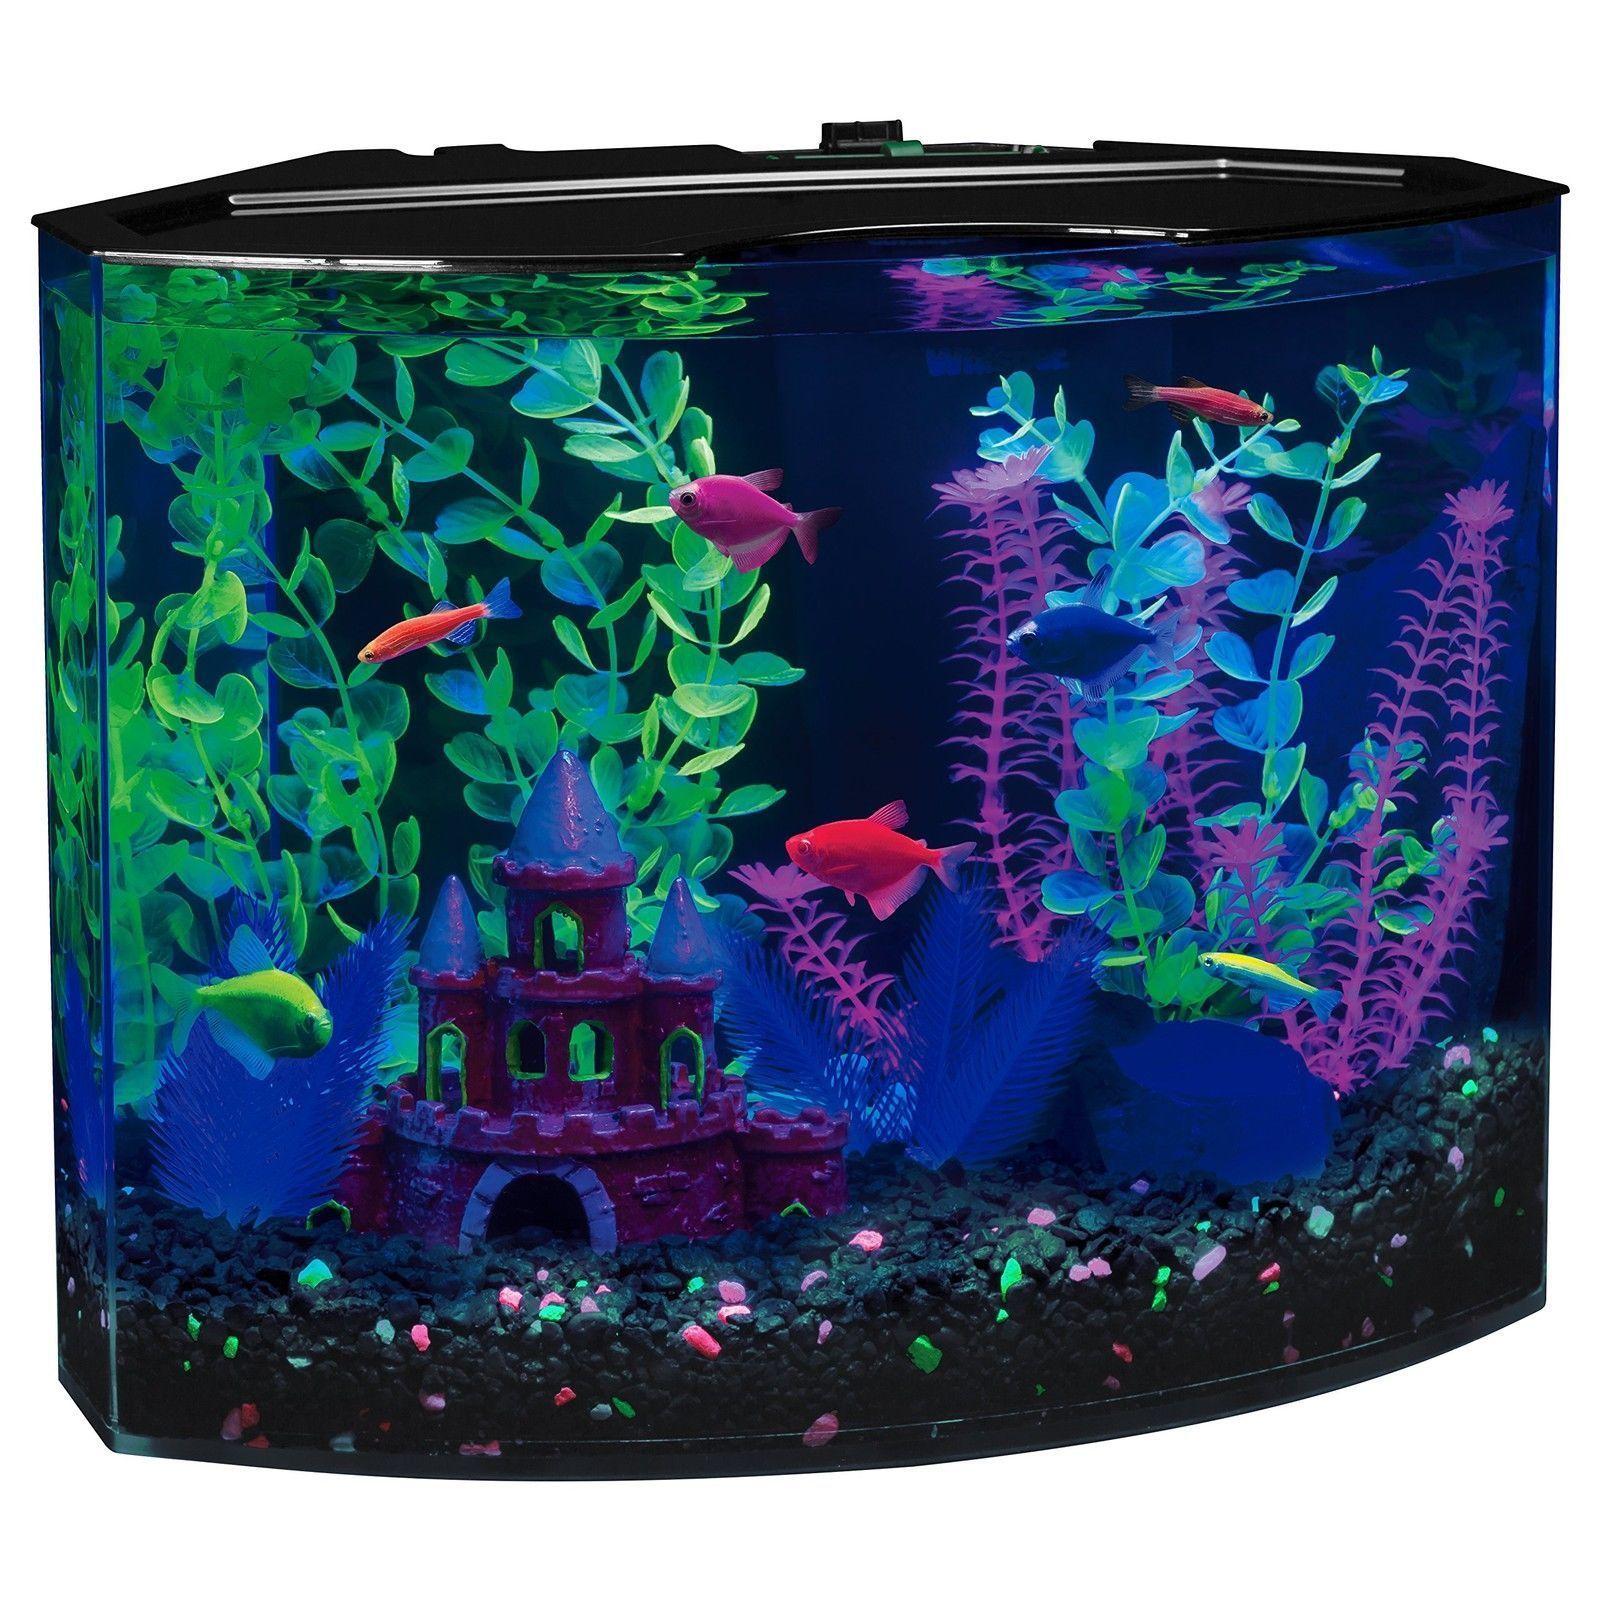 Jbj aquarium fish tank siphon gravel vacuum cleaner - Animals Fish And Aquariums Aquarium Kit With Blue Led Light 5 Gallon Aquatic Pets Fish Tank New Buy It Now Only 68 43 Pinterest